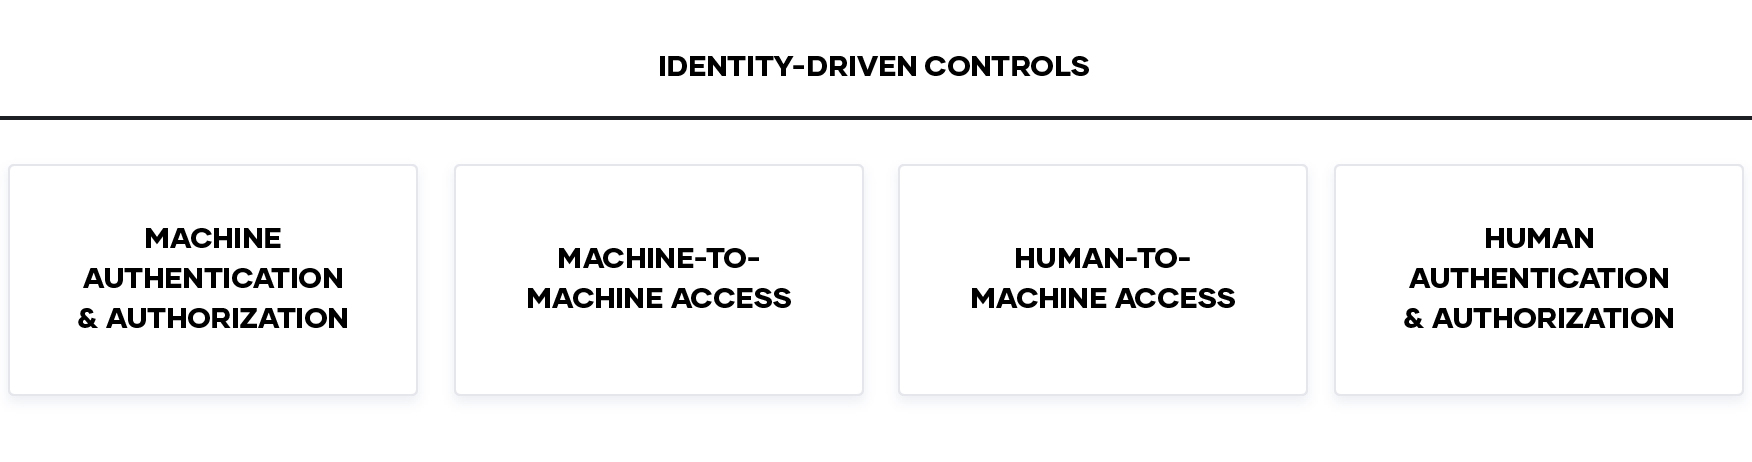 Identity driven controls chart